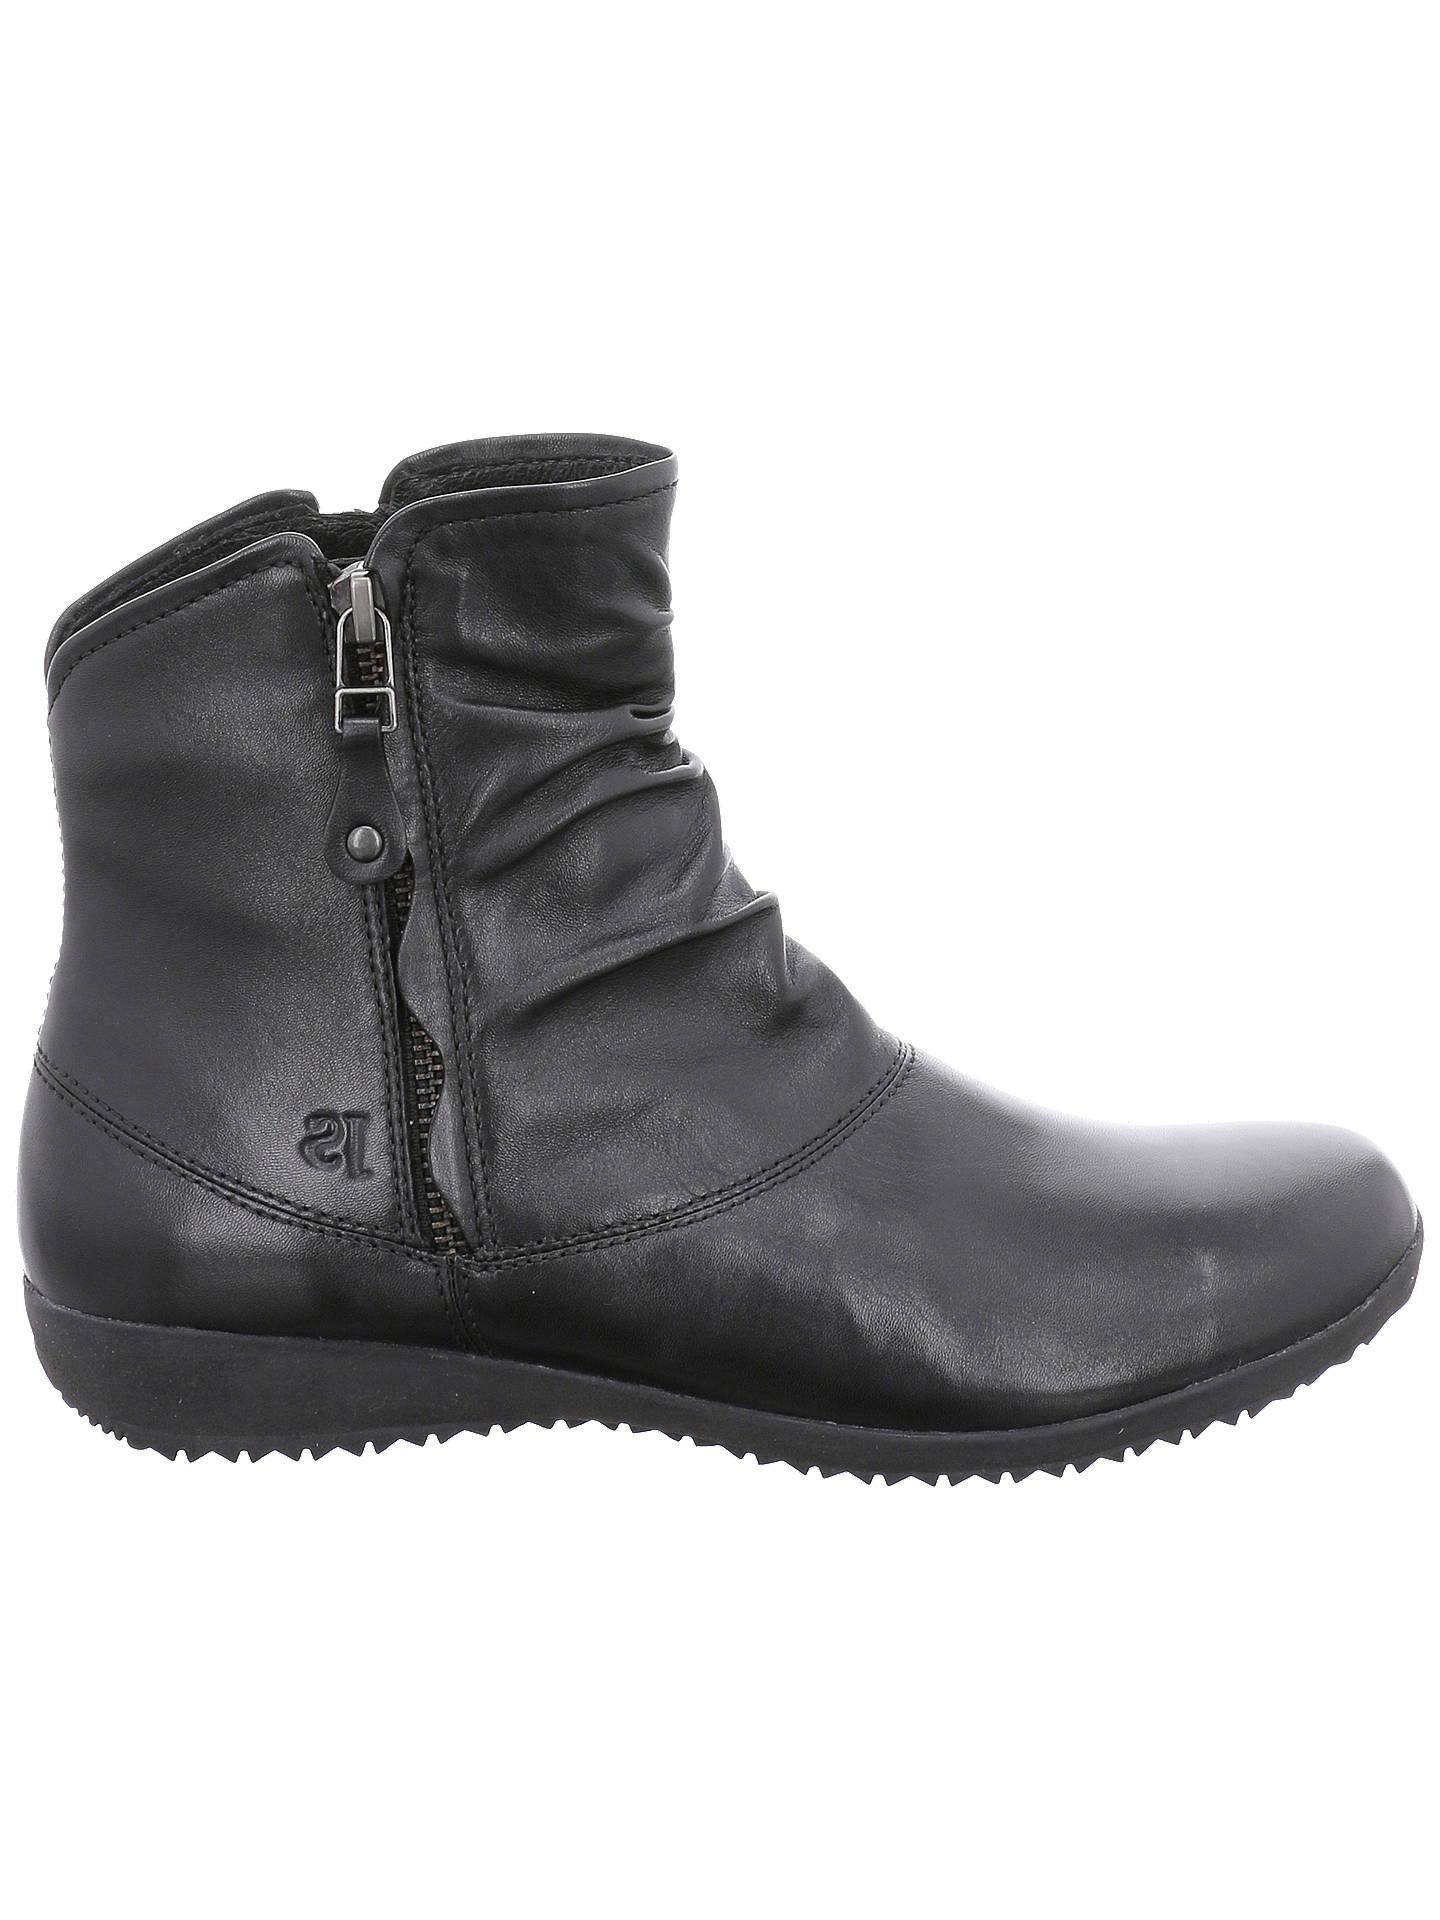 6a1271ea58e1 Buy Josef Seibel Naly 24 Wedge Heel Ankle Boots